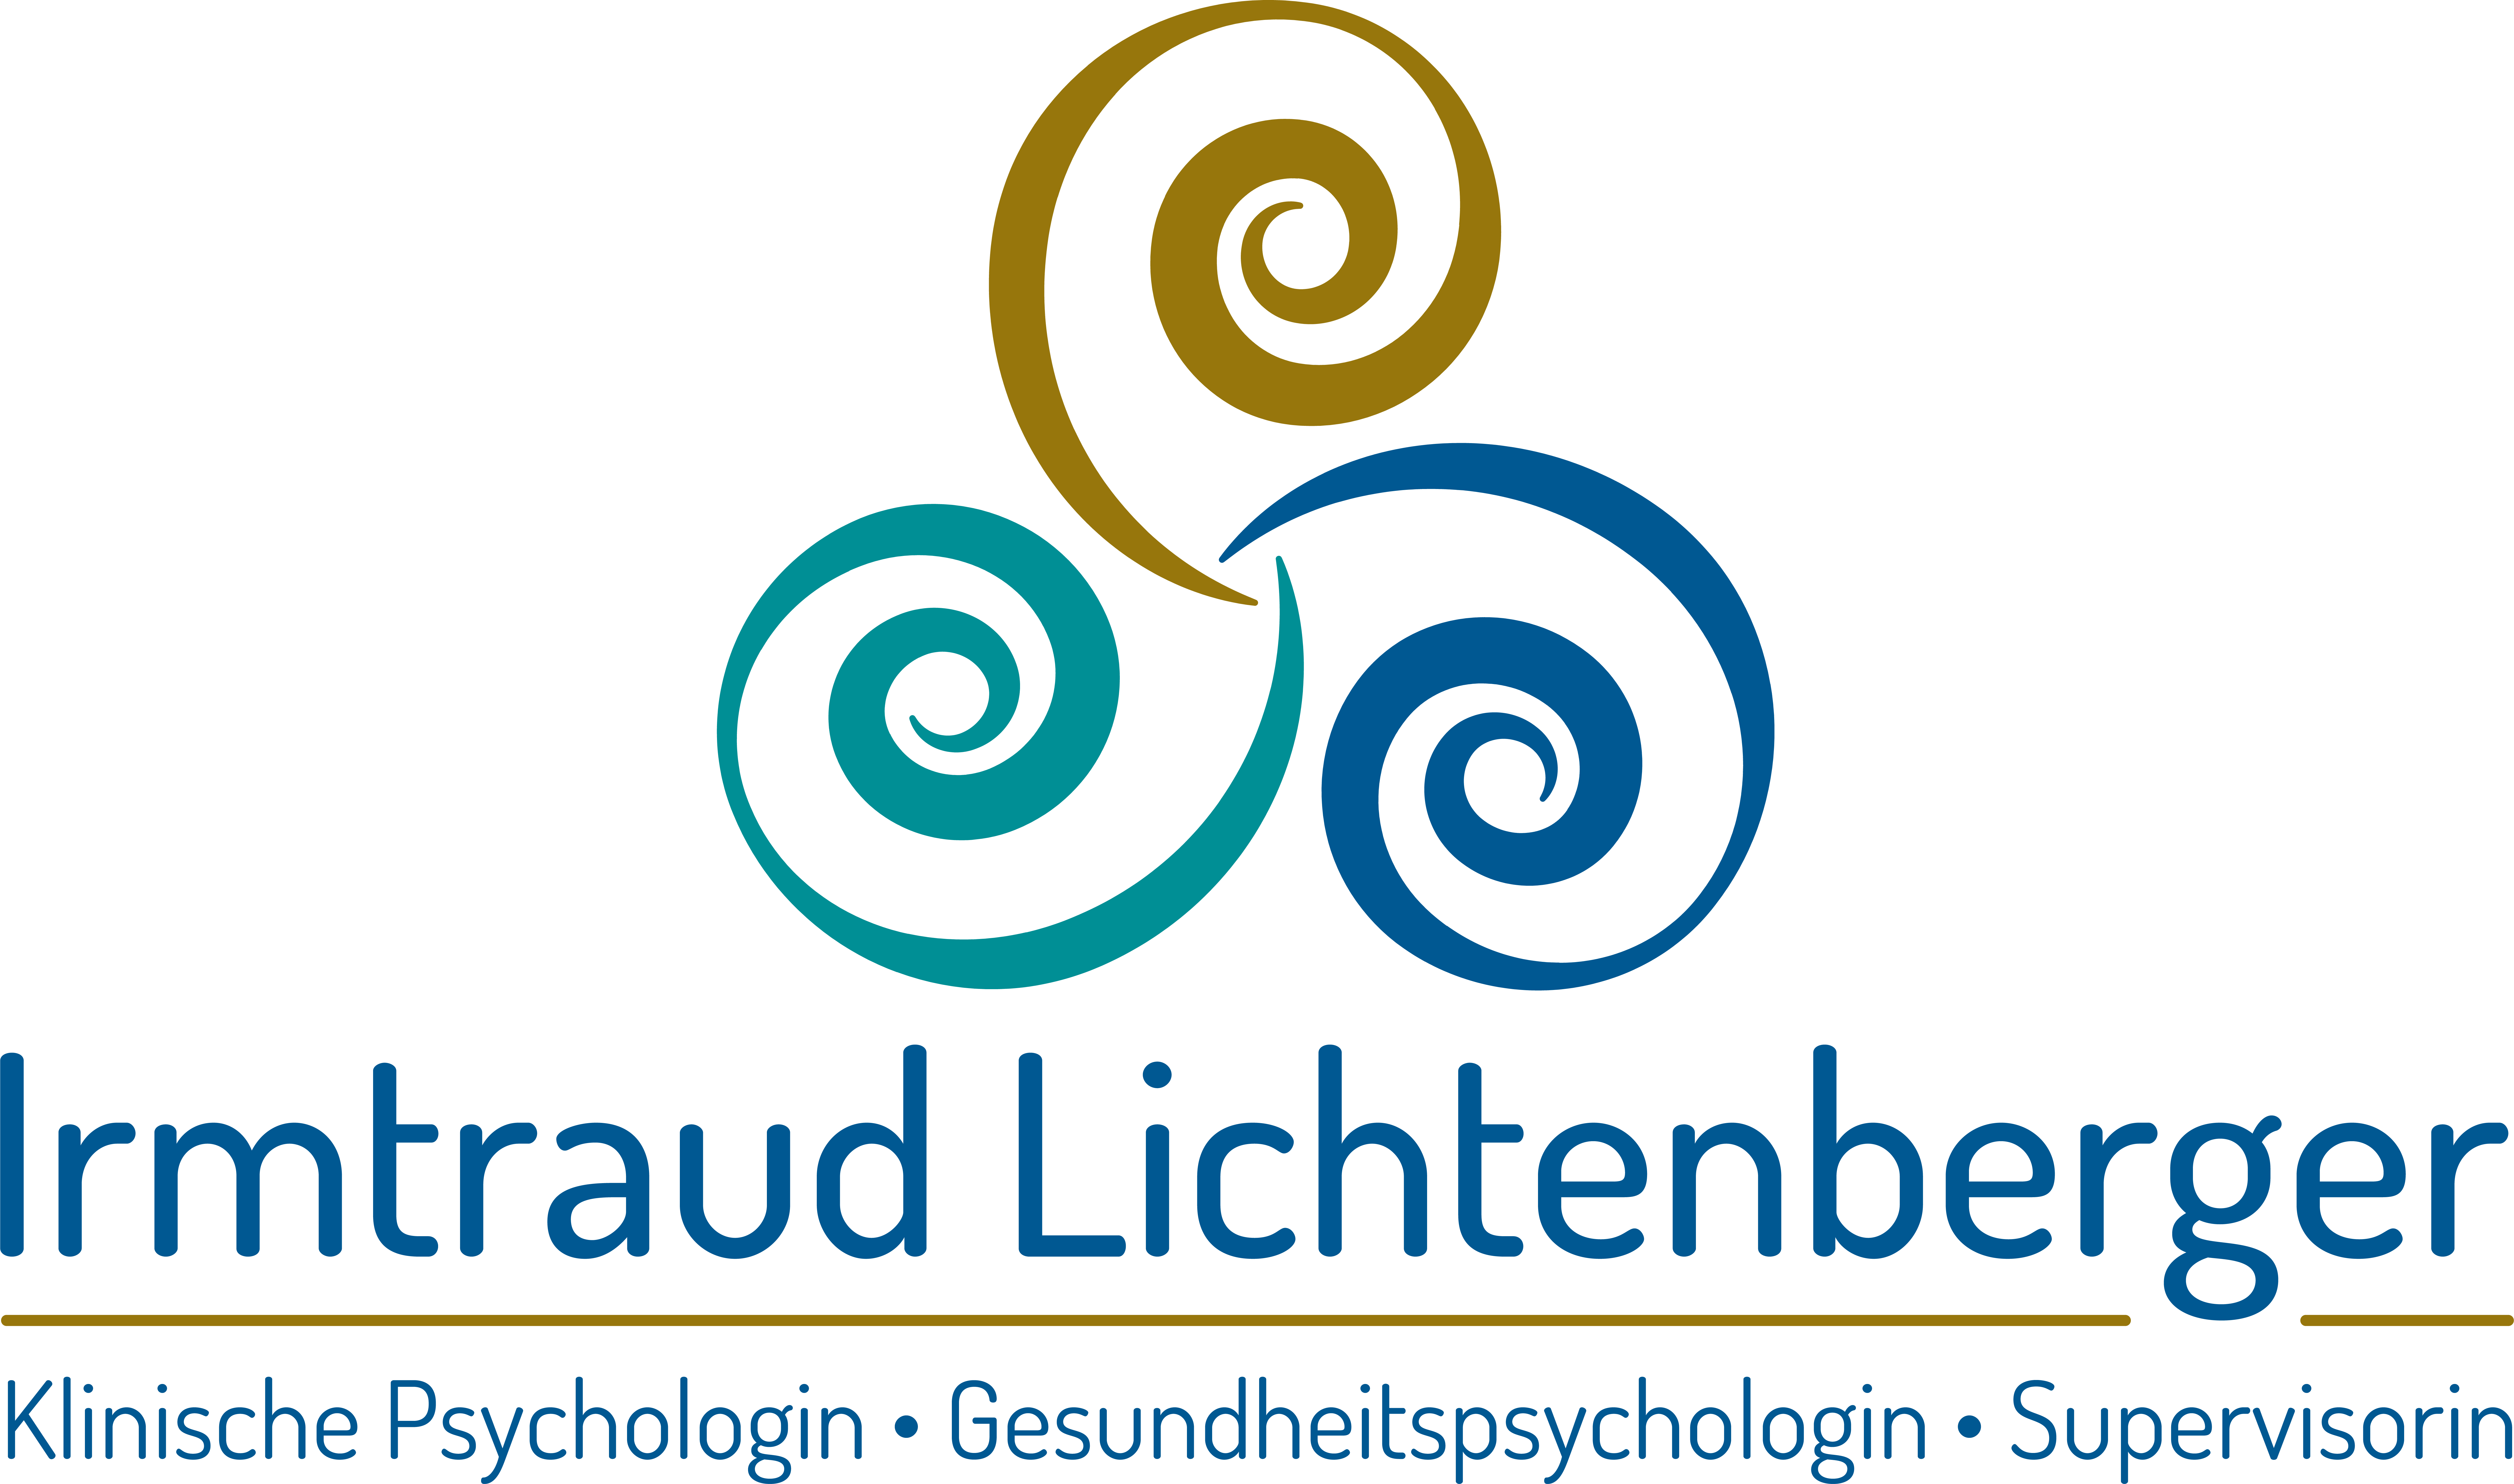 Mag.a Irmtraud Lichtenberger